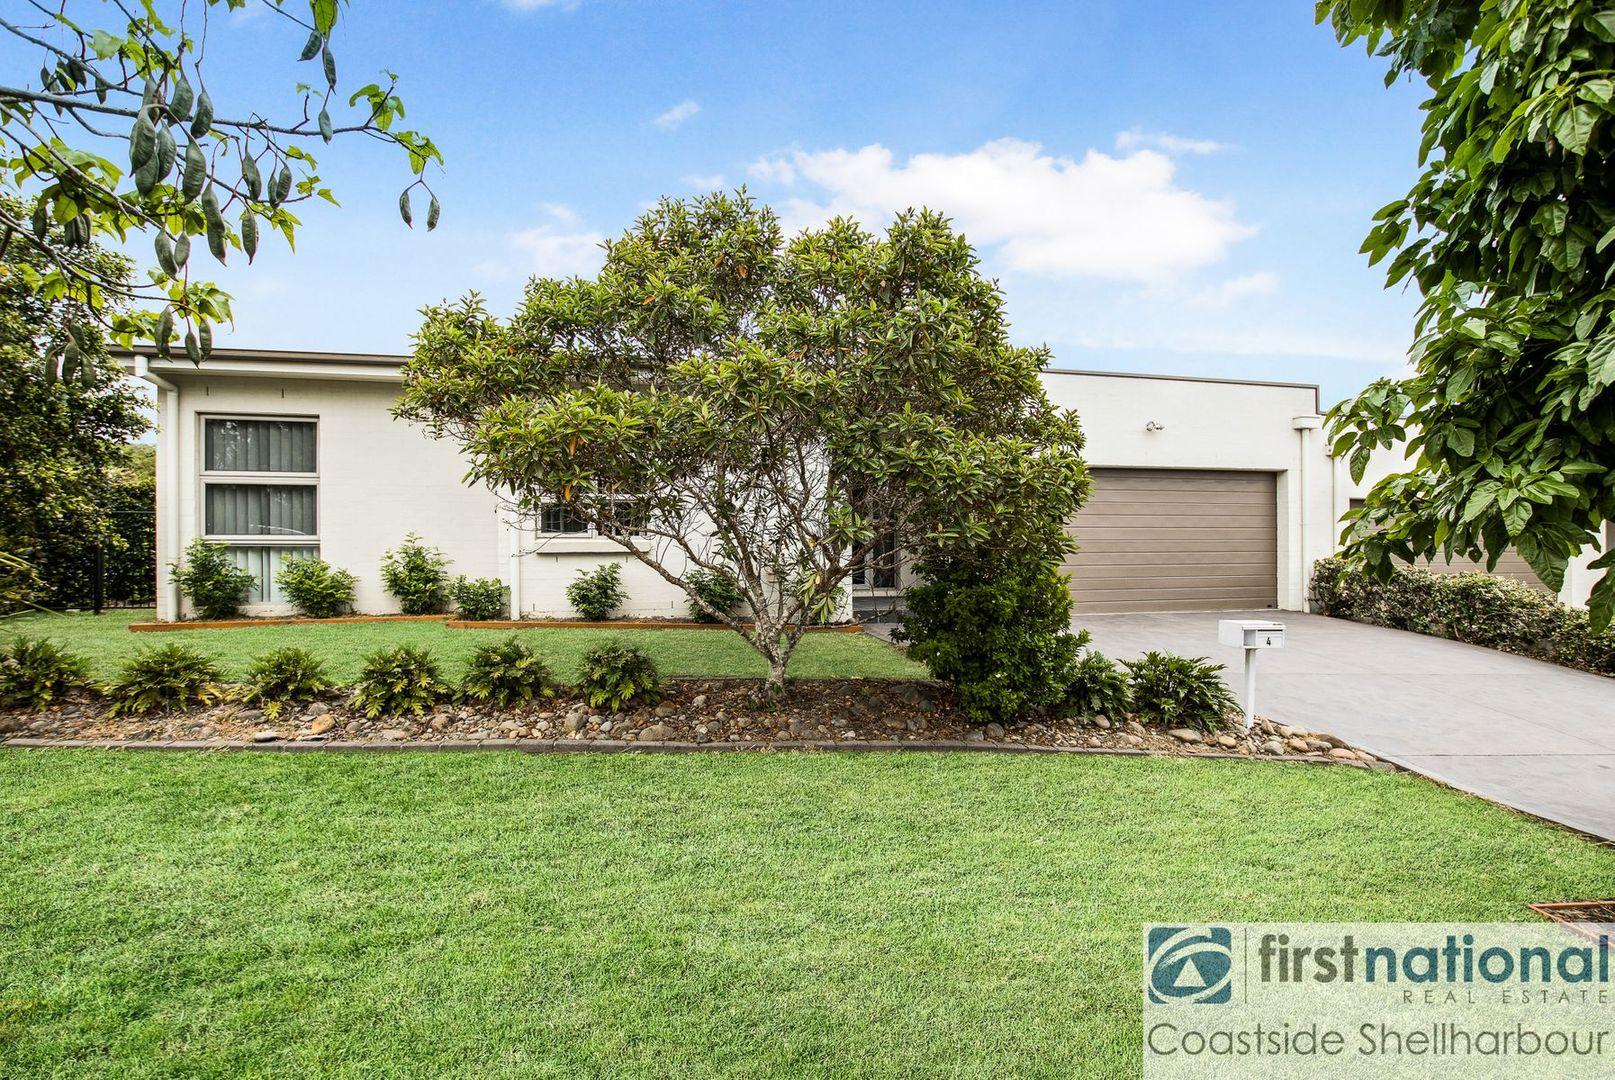 4 Bush Street, Flinders NSW 2529, Image 0